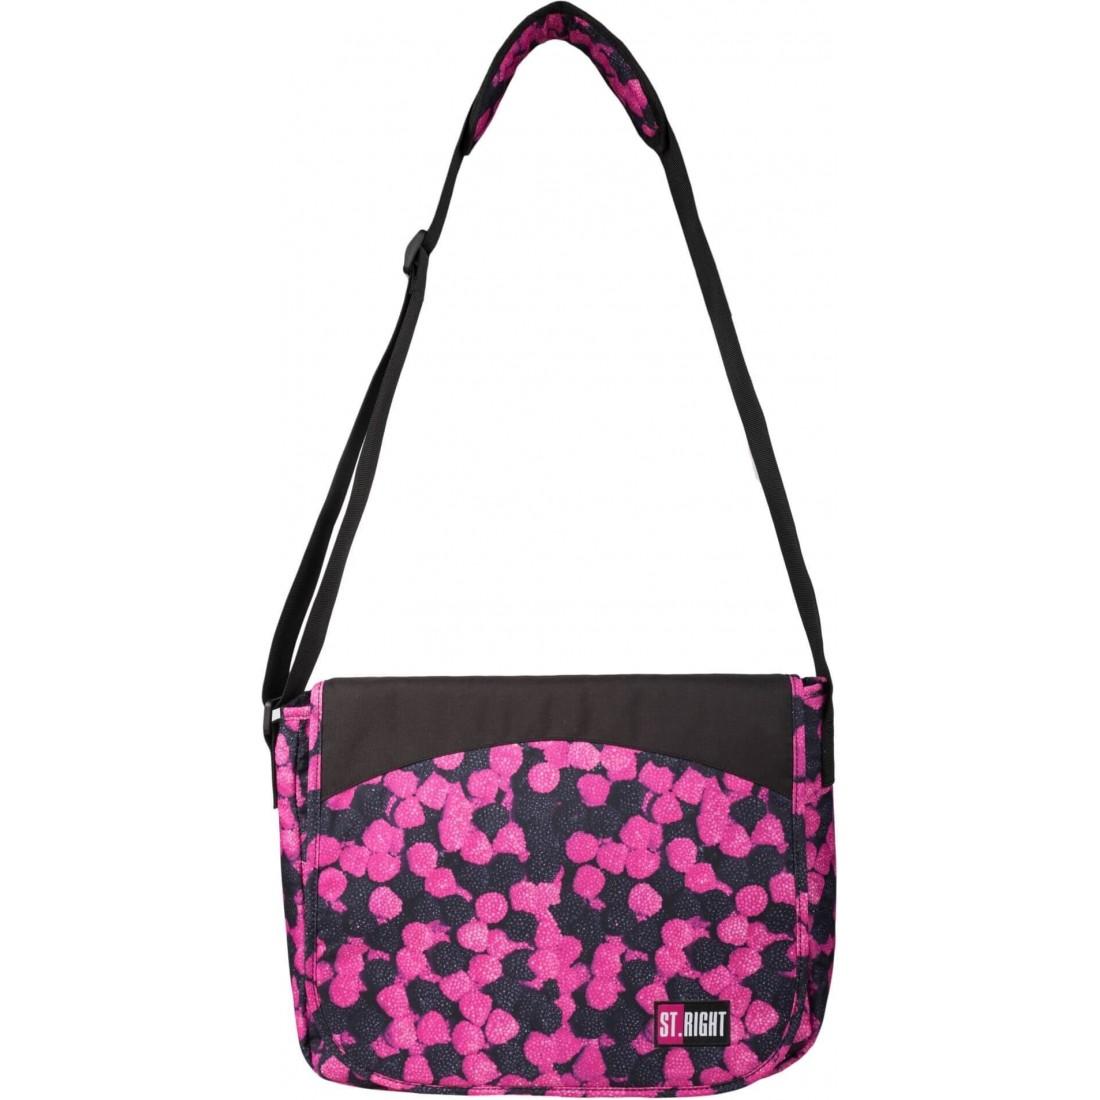 Długi pasek pozwoli na wygodne noszenie torby ST.Right Berries SB01